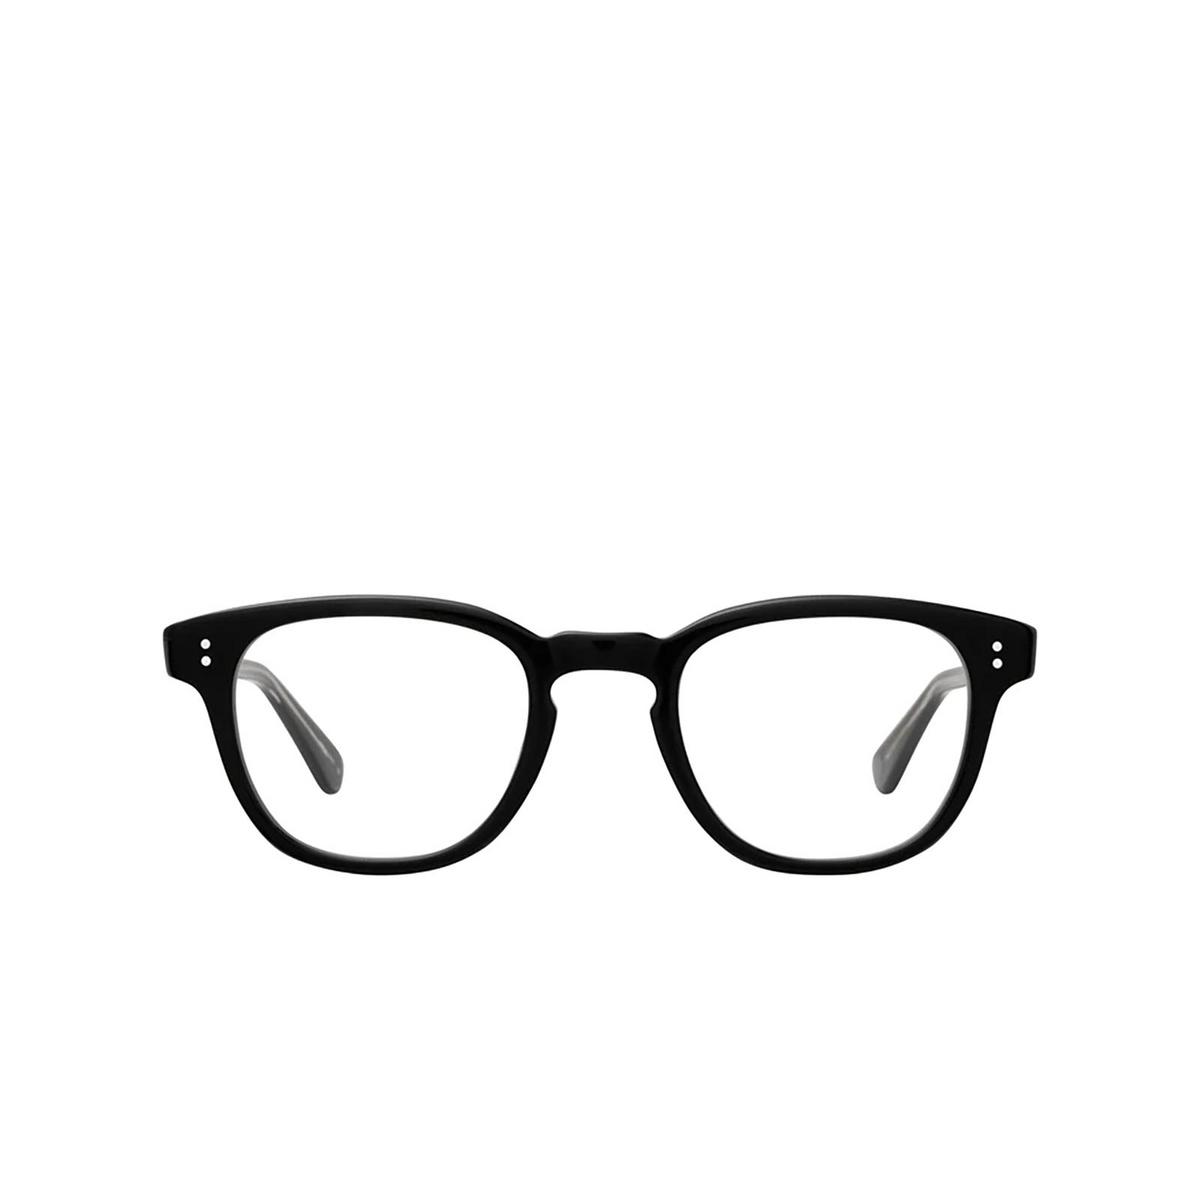 Garrett Leight® Square Eyeglasses: Douglas color Black Bk - front view.